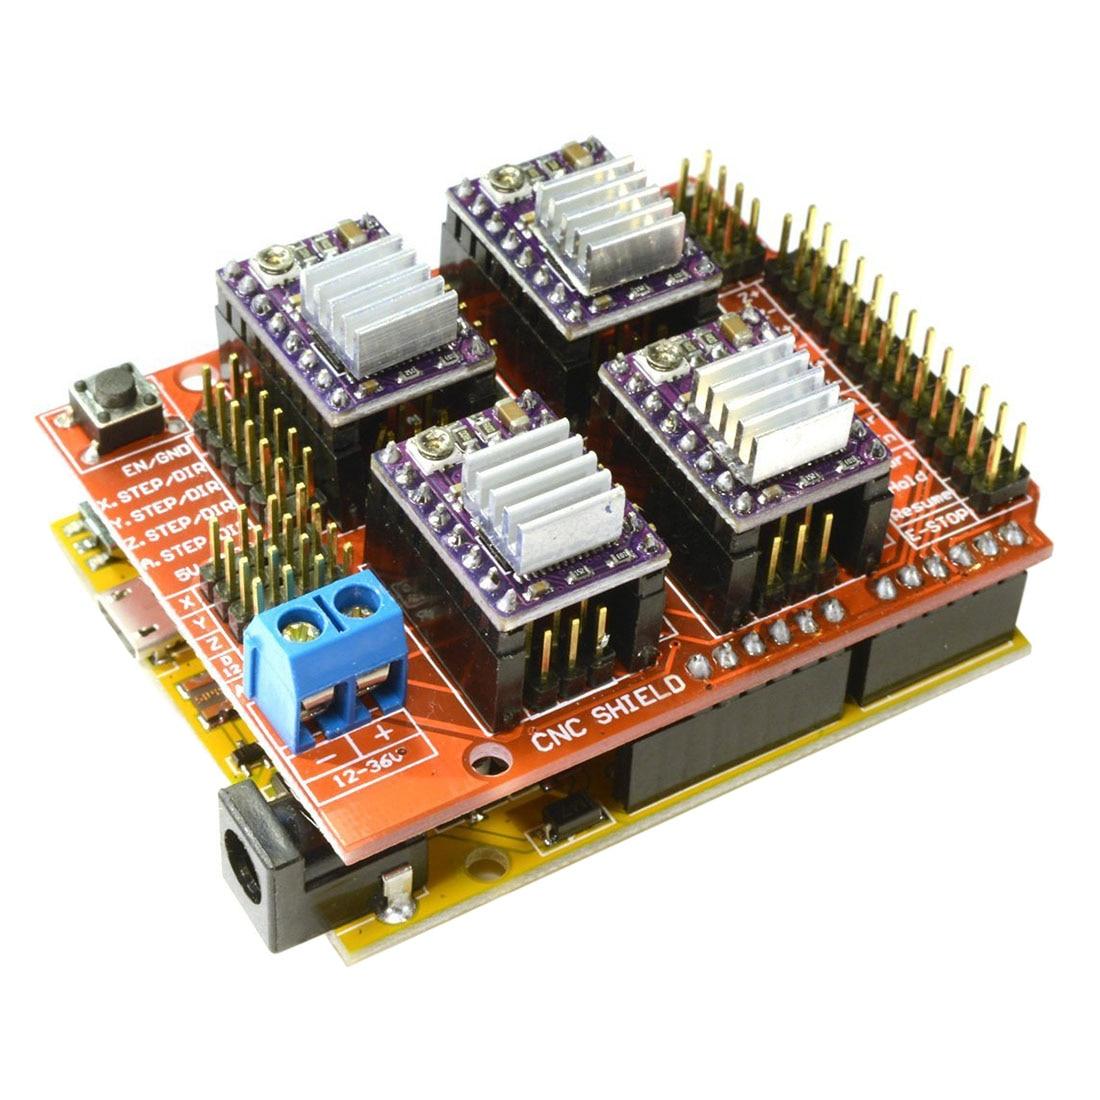 CNC V3 Shield + UNO R3 Compatible Board + 4x TI DRV8825 StepStick Stepper Drivers Red+purple cnc shield expansion board v3 0 4pcs a4988 drv8825 stepper motor driver with heatsink with uno r3 board for arduino kits